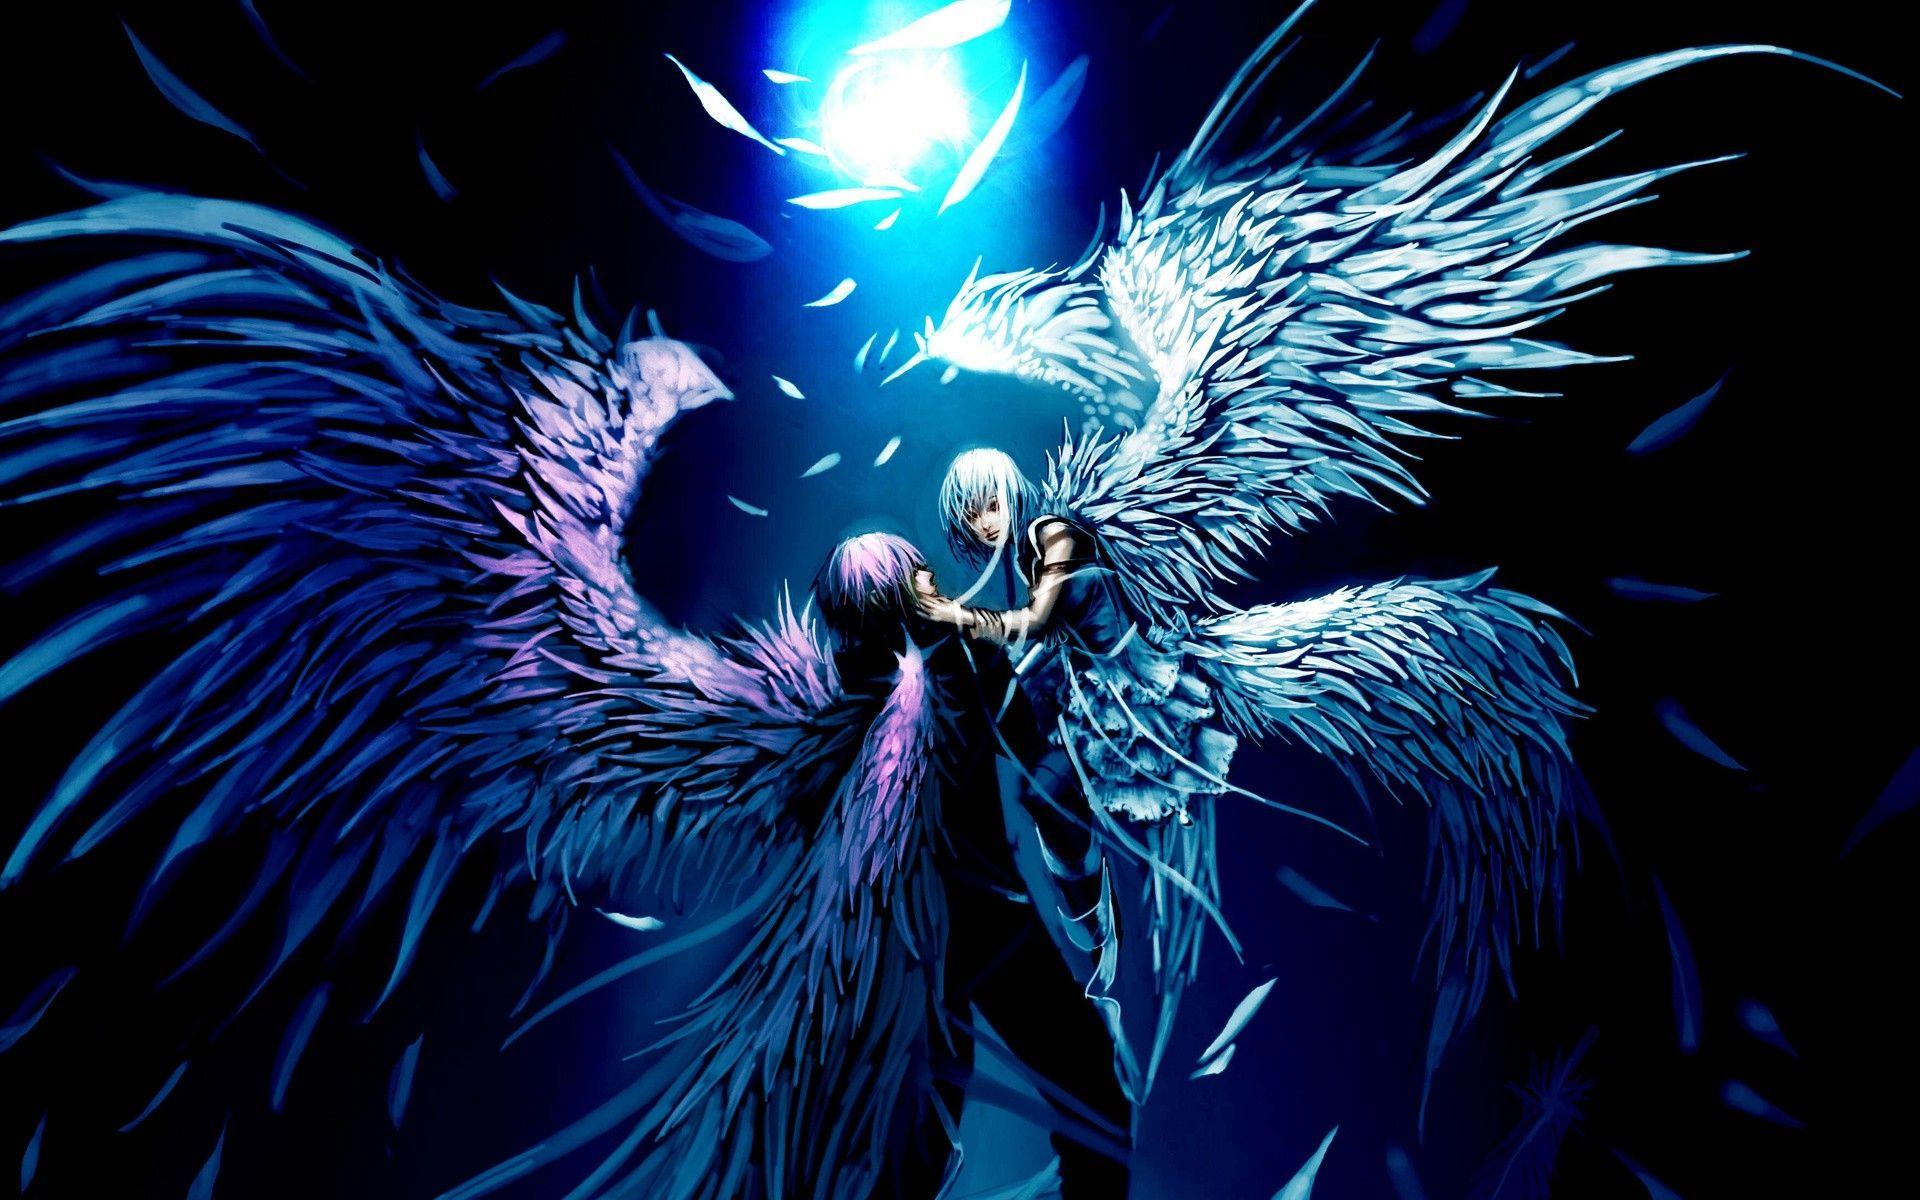 Anime Cupid Angel Hd Wallpaper Fondo De Anime Anime Oscuro